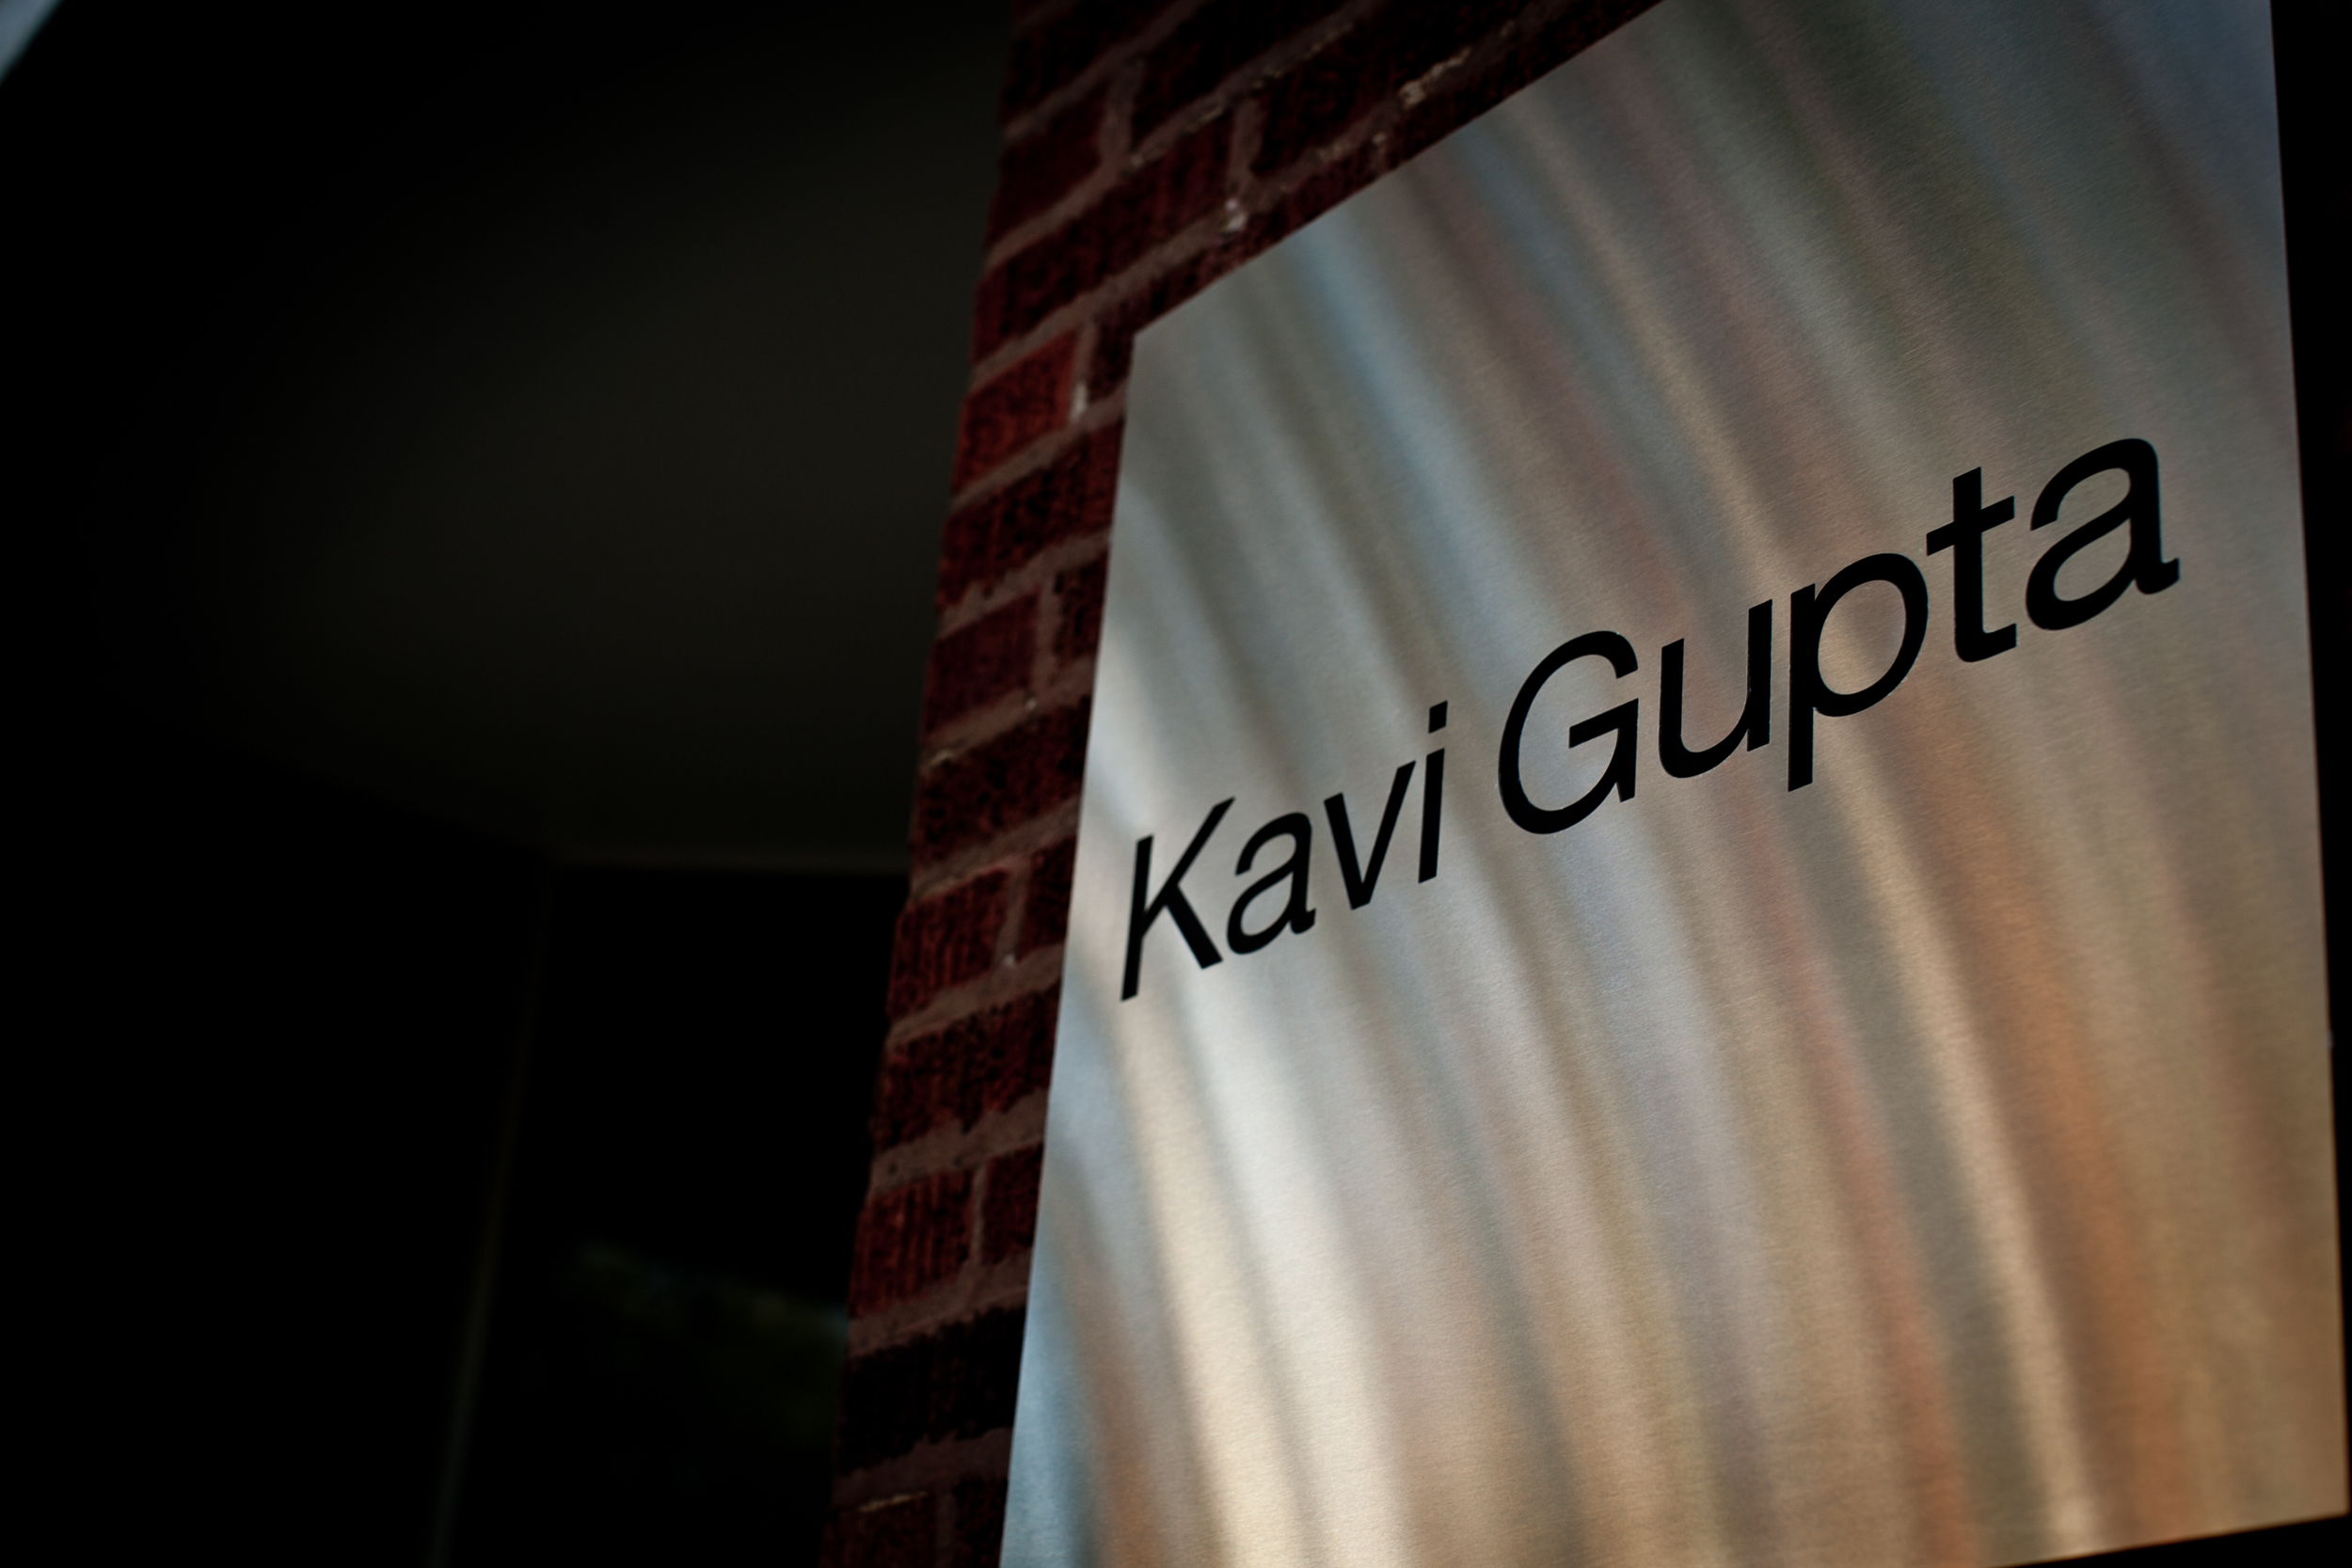 Kavi Gupta West Loop Expo Chicago Mickalene Thomas Glenn Kaino modern art sculpture chicago-0003.jpg